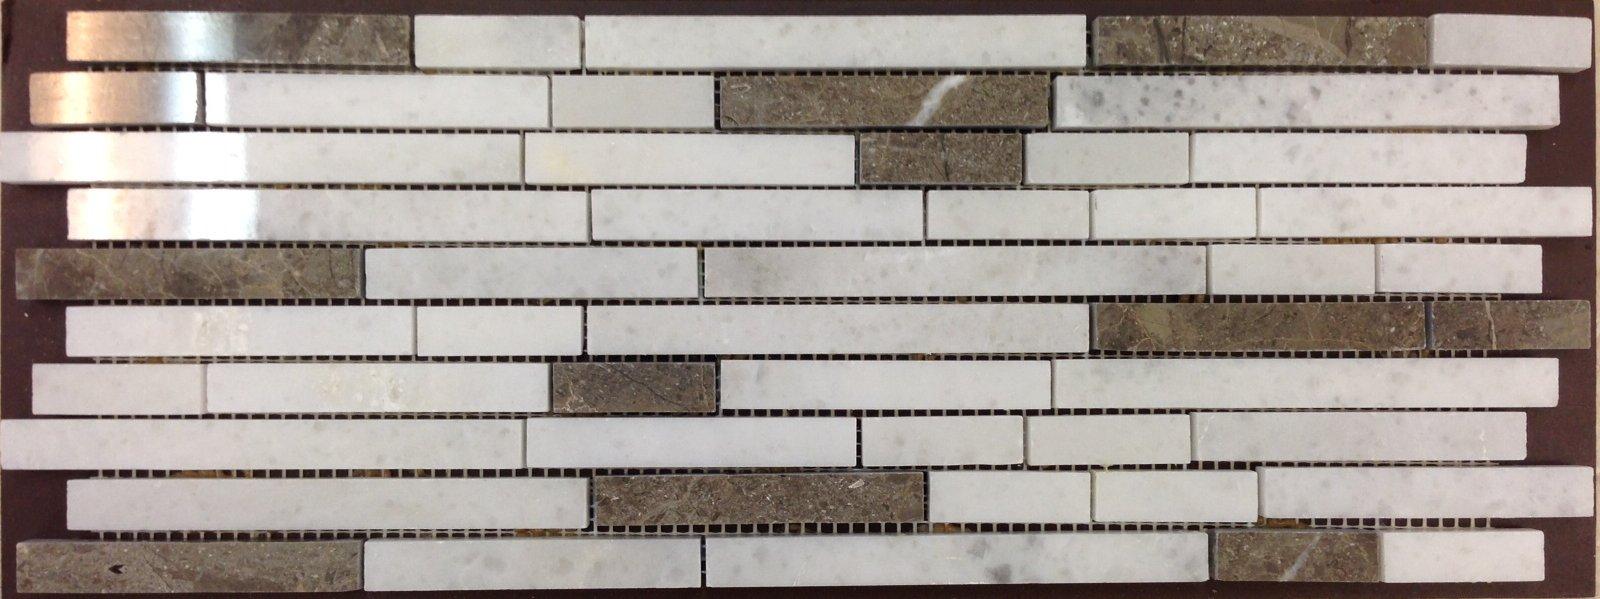 kitchen backsplash stone glass aluminium kleinburg commercial kitchen simple materials subway tile backsplash